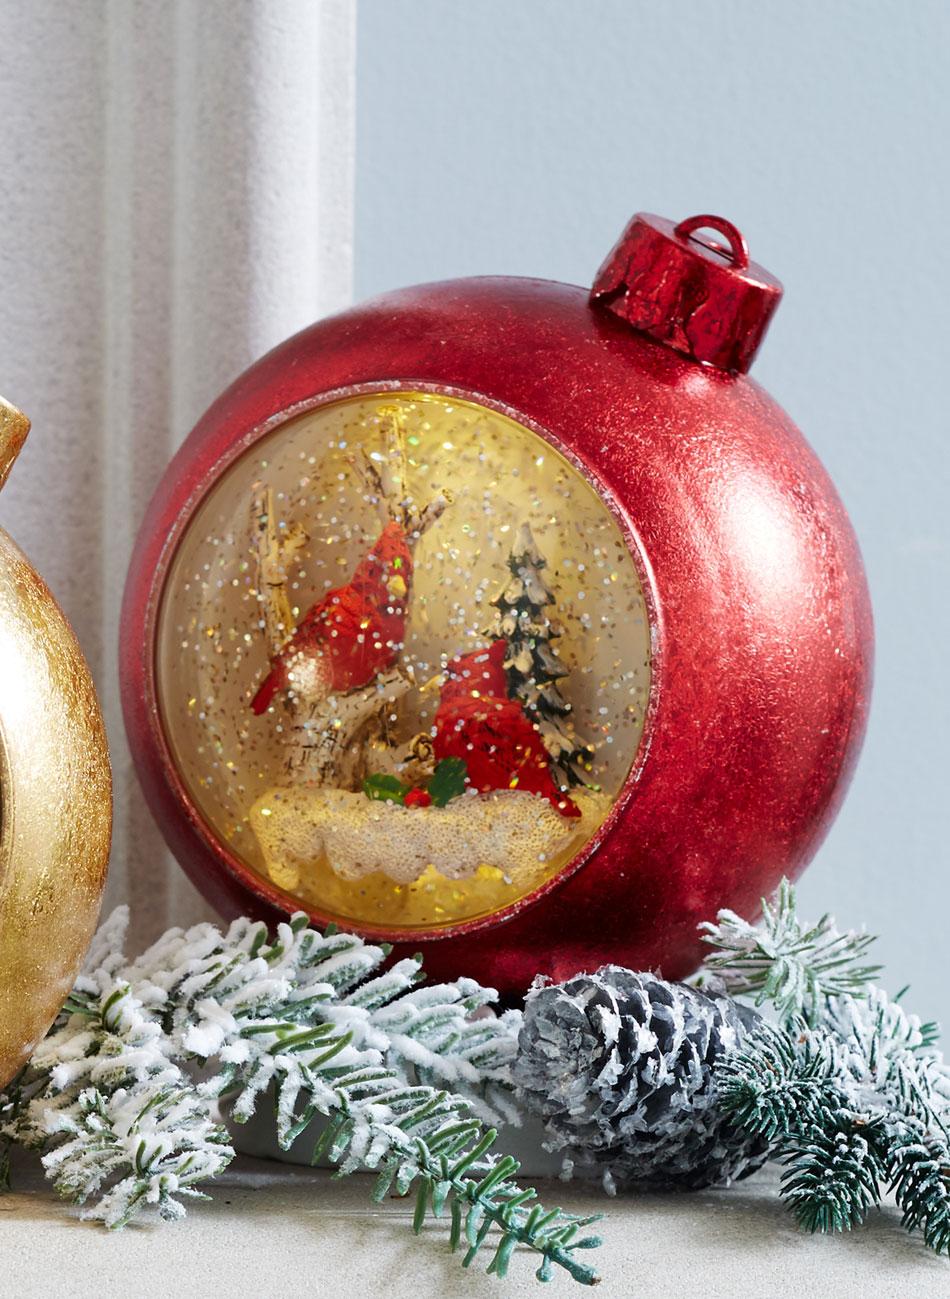 Remote Control Christmas Lights